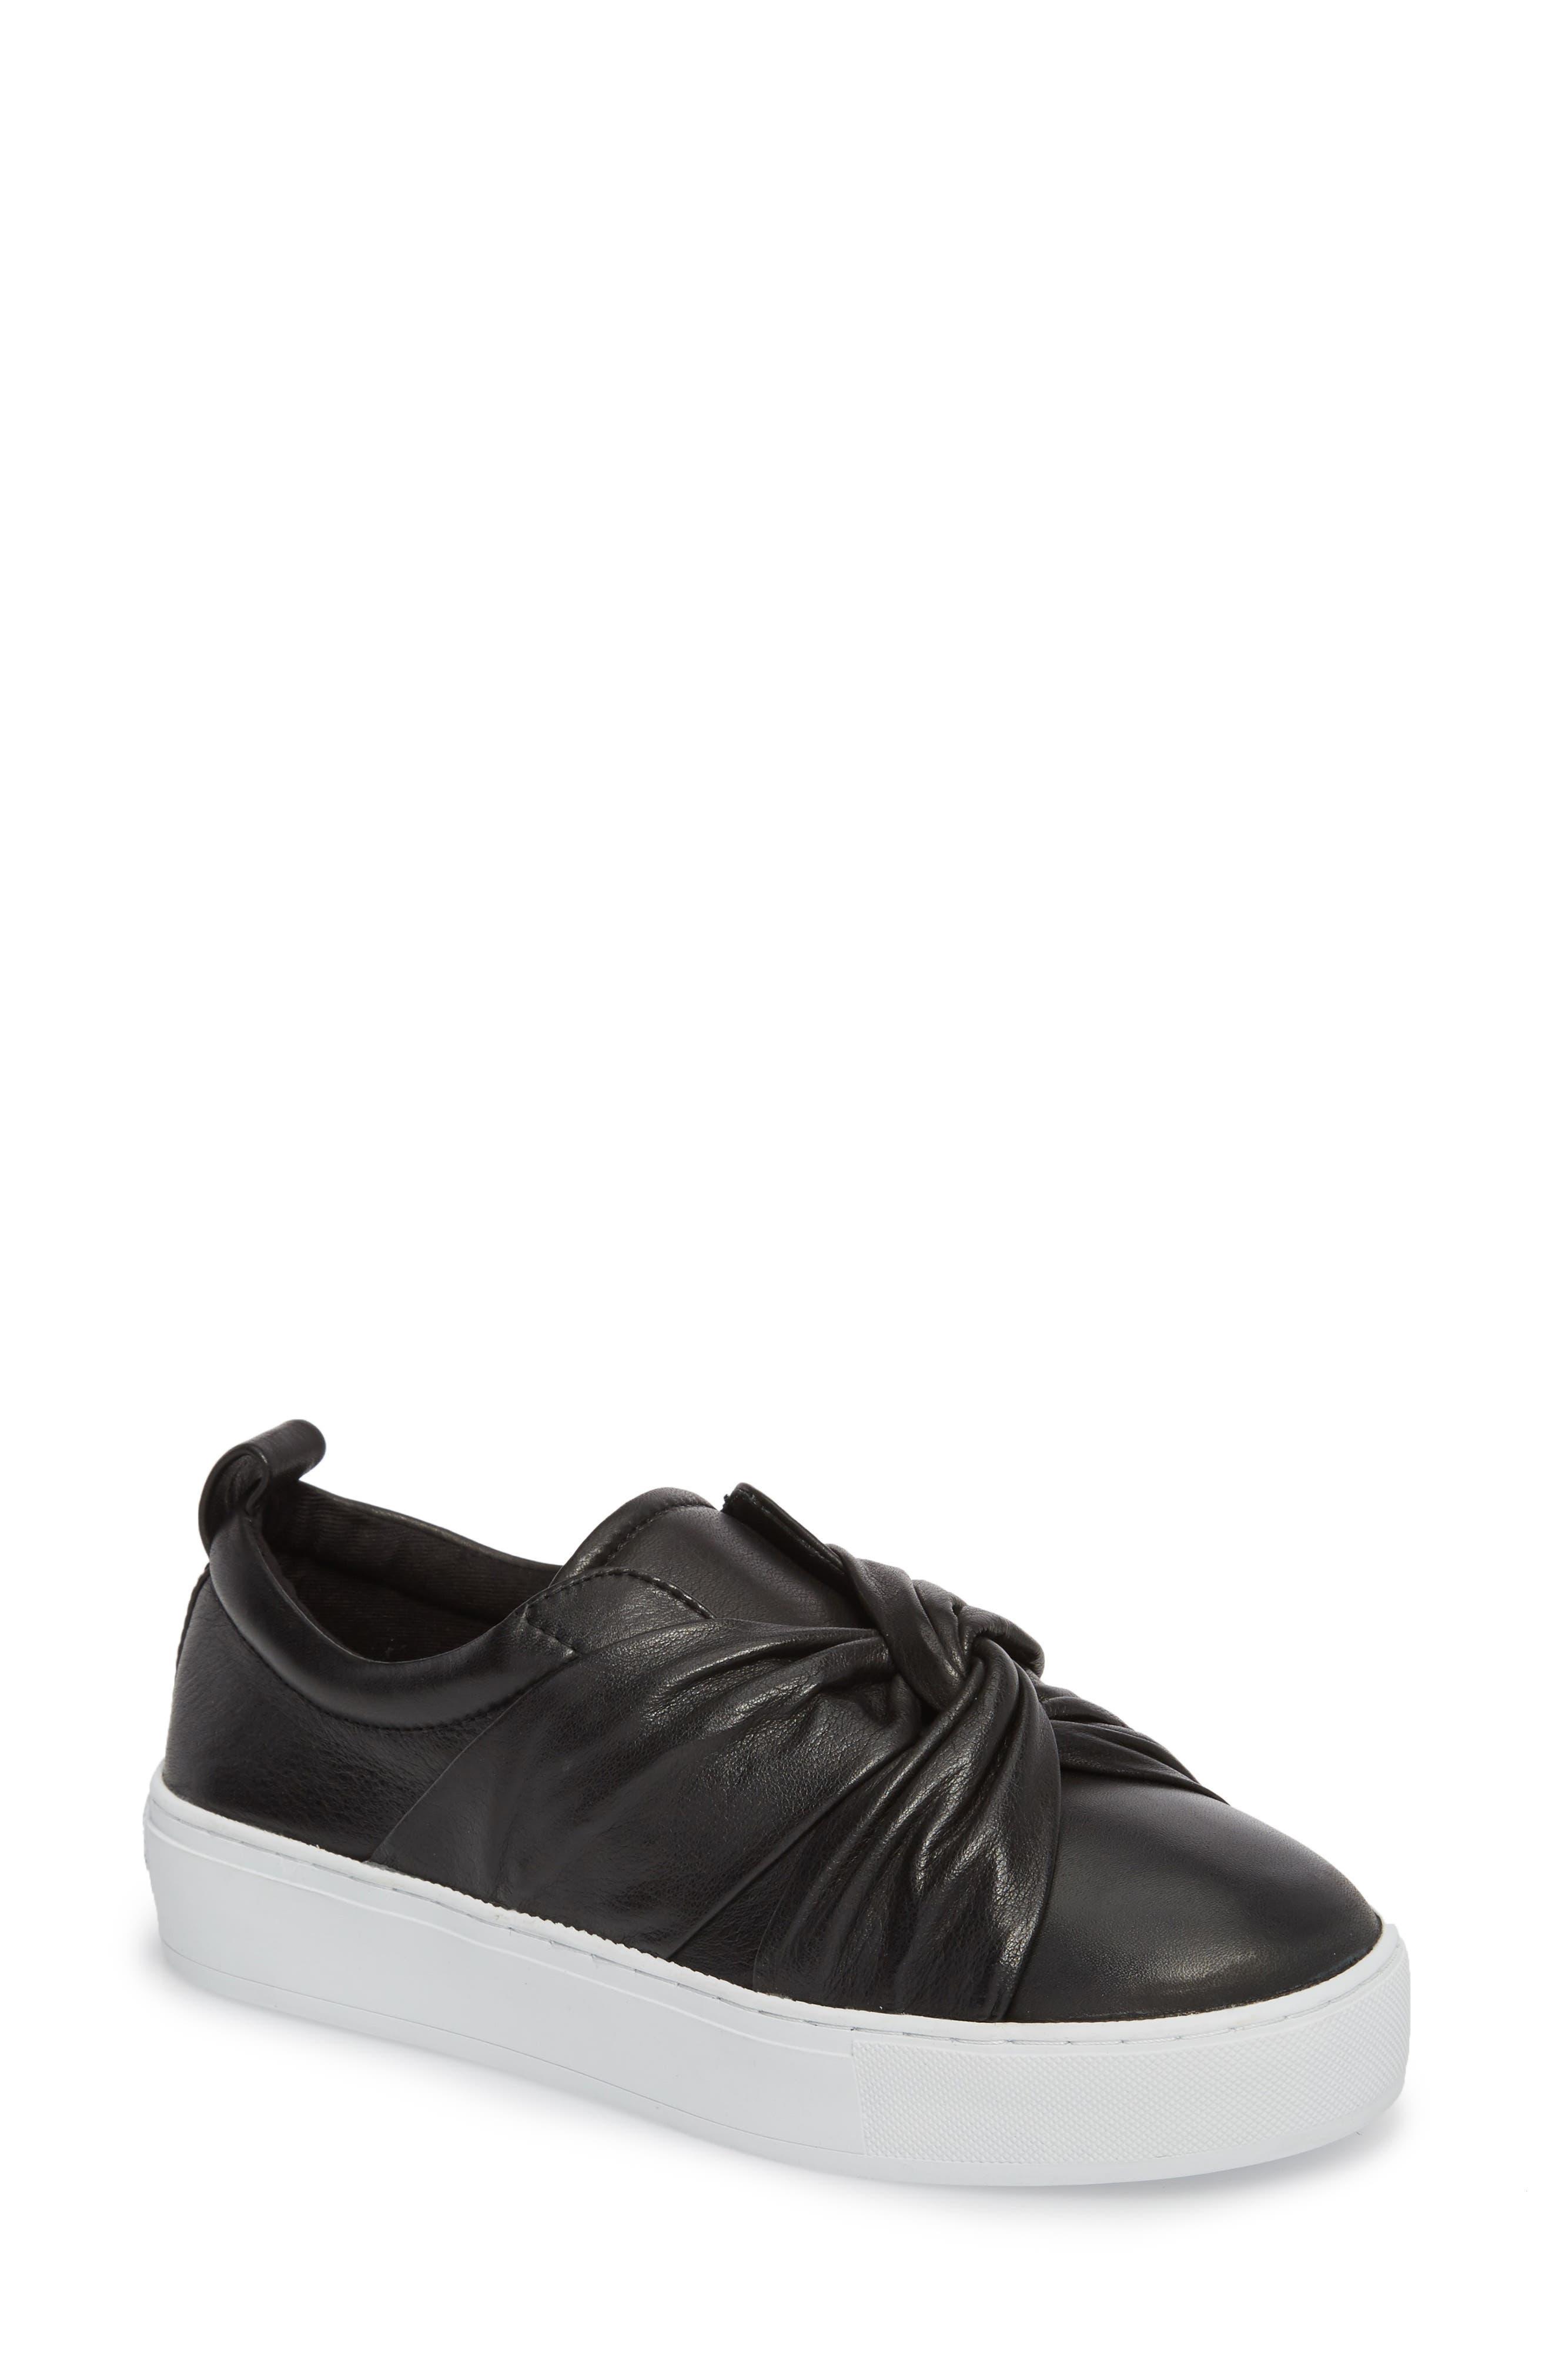 Nicole Platform Sneaker,                             Main thumbnail 1, color,                             Black Leather